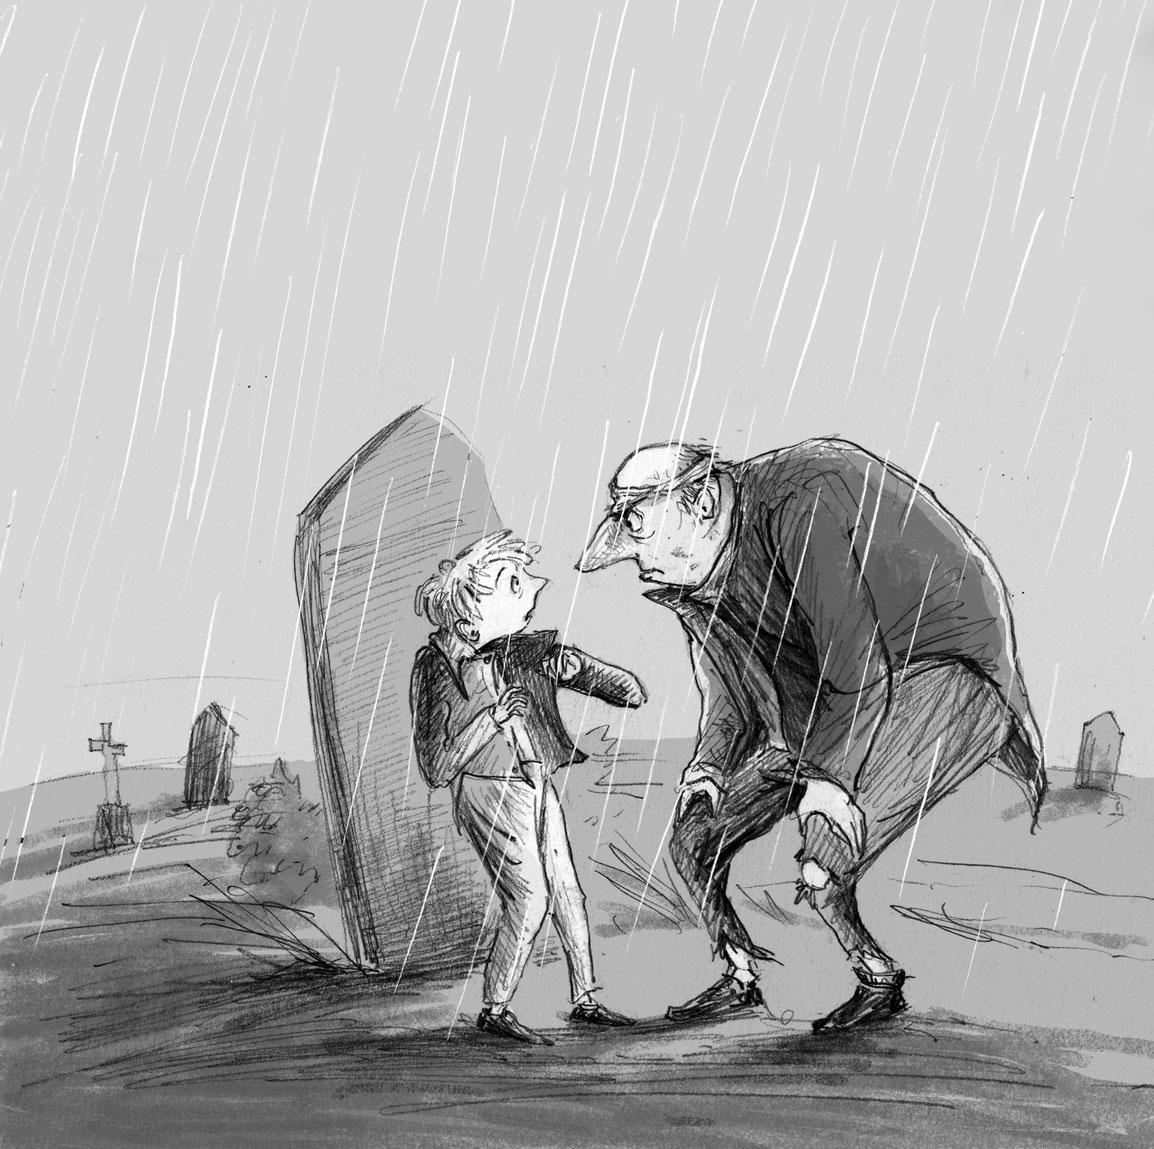 Sarah Warburton Illustrations: What The Dickens?